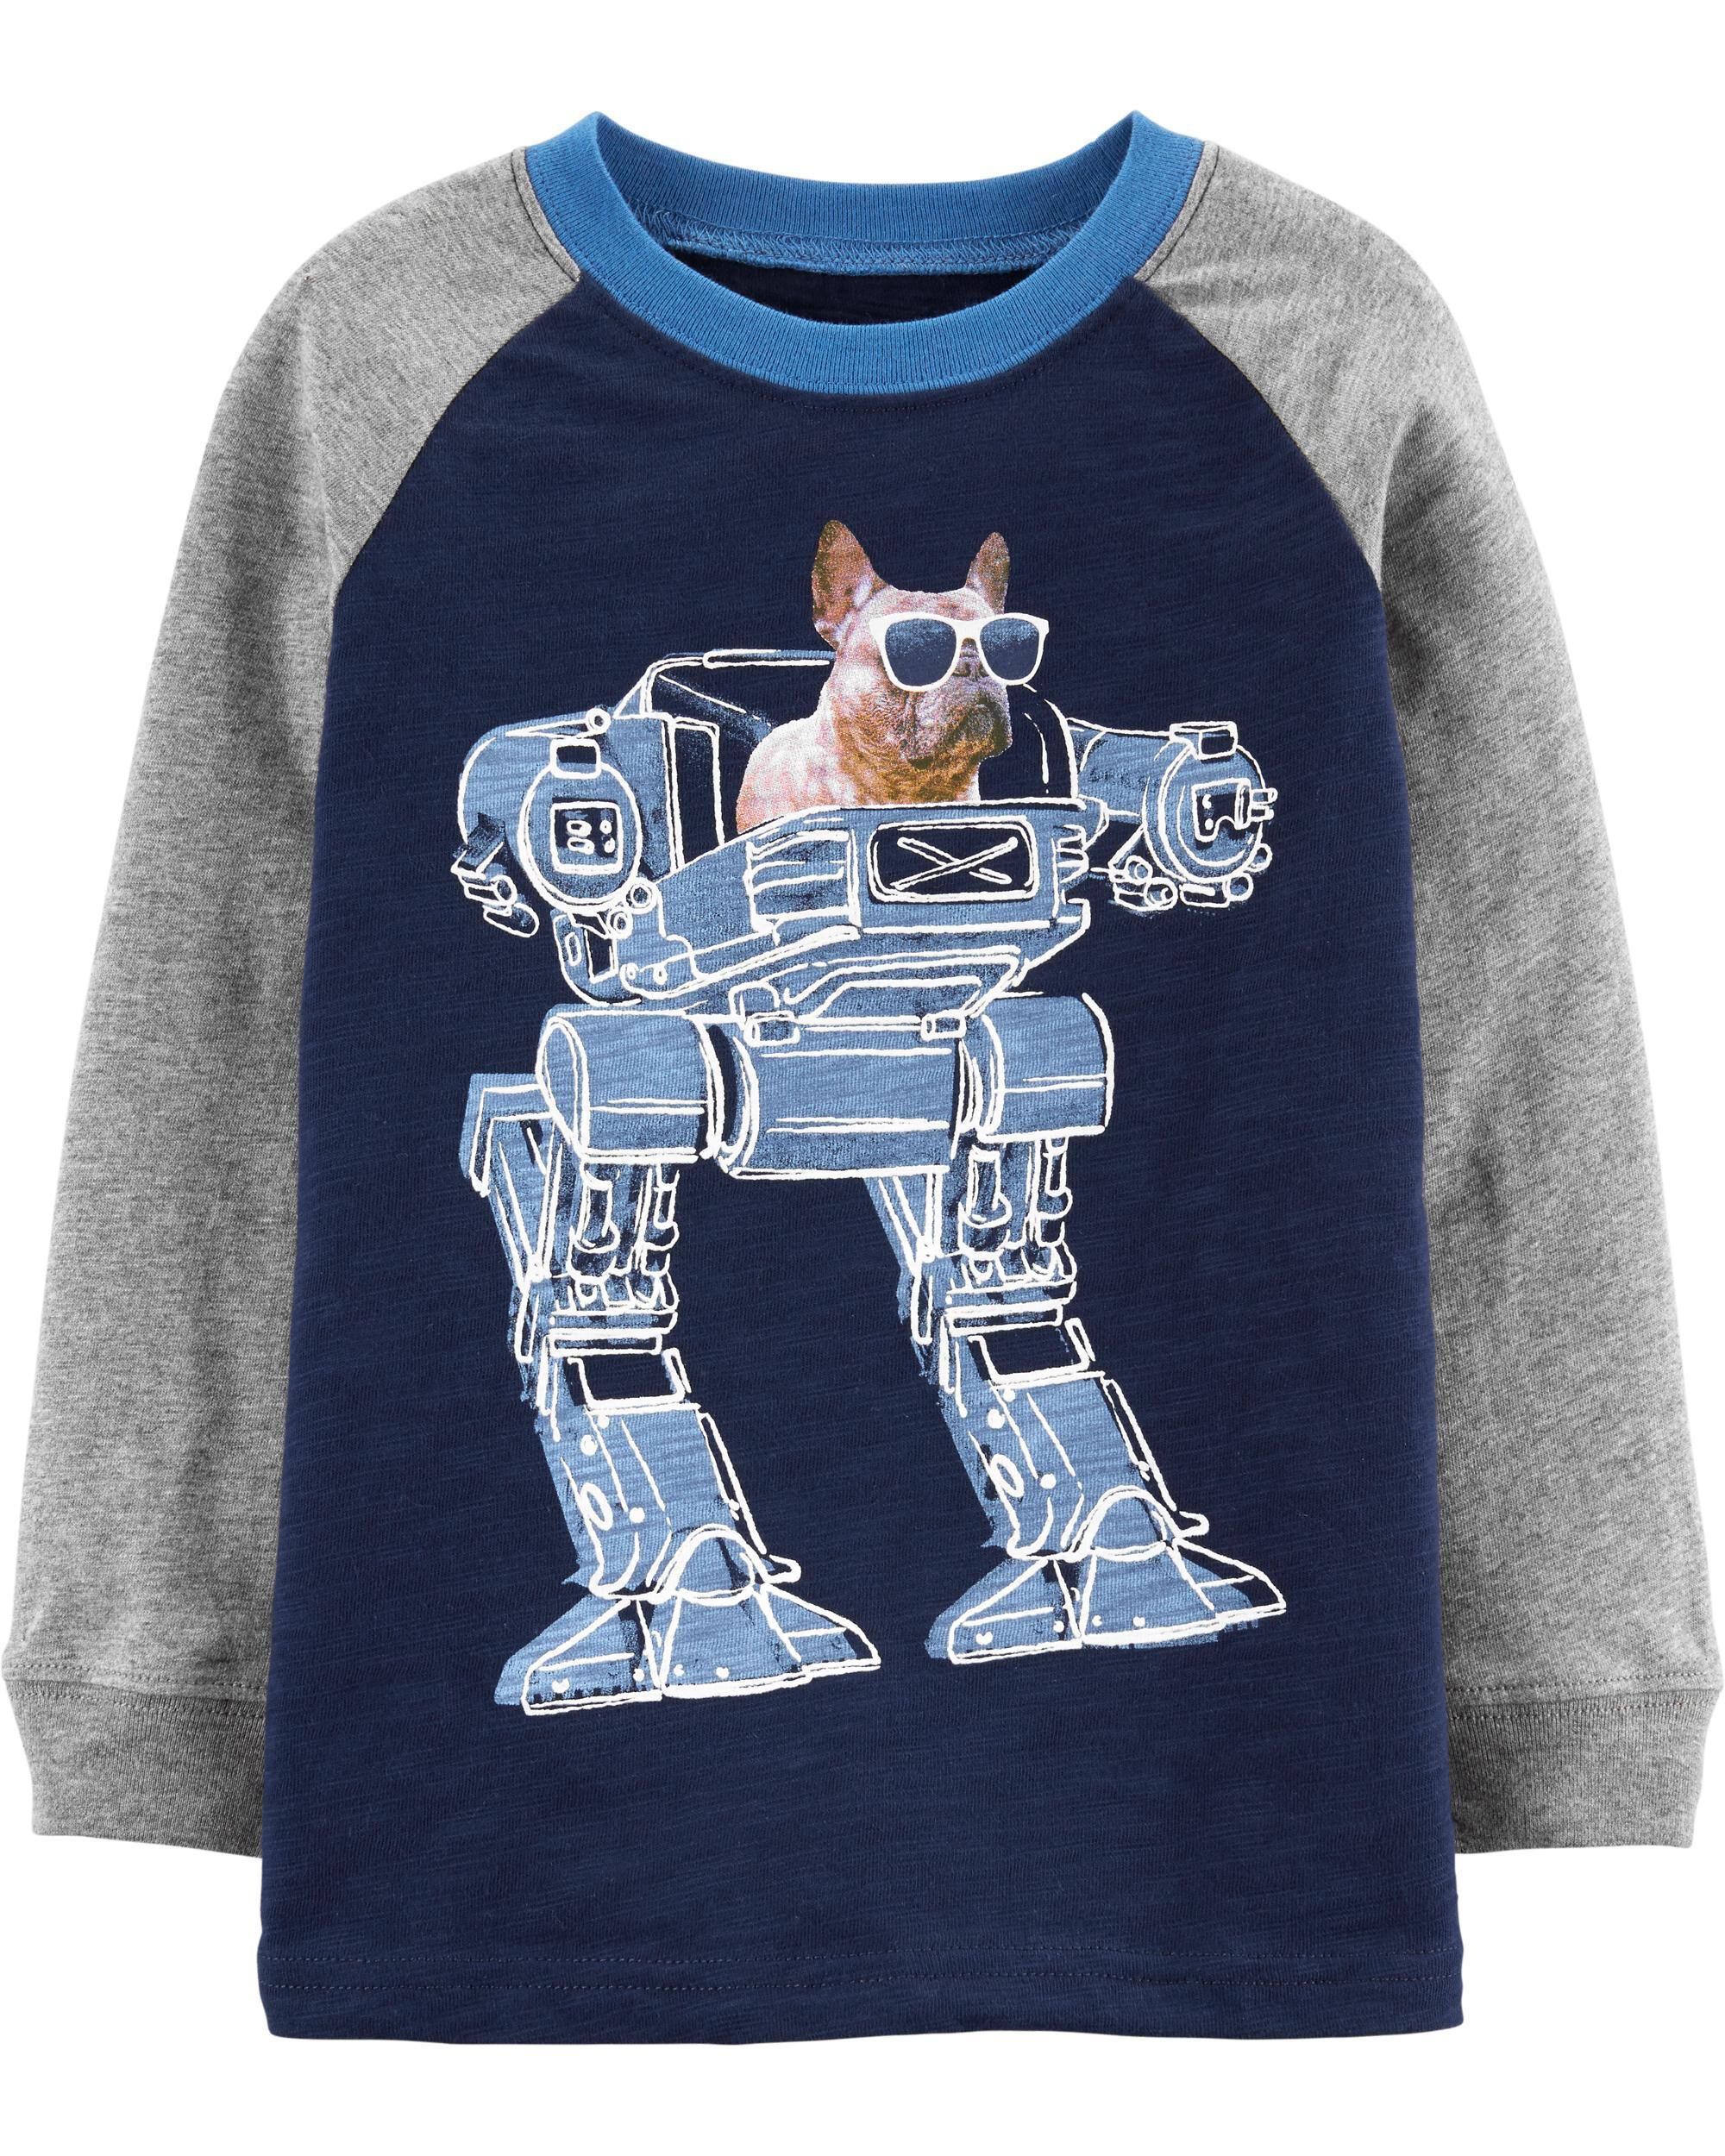 *CLEARANCE* French Bulldog Robot Slub Jersey Tee